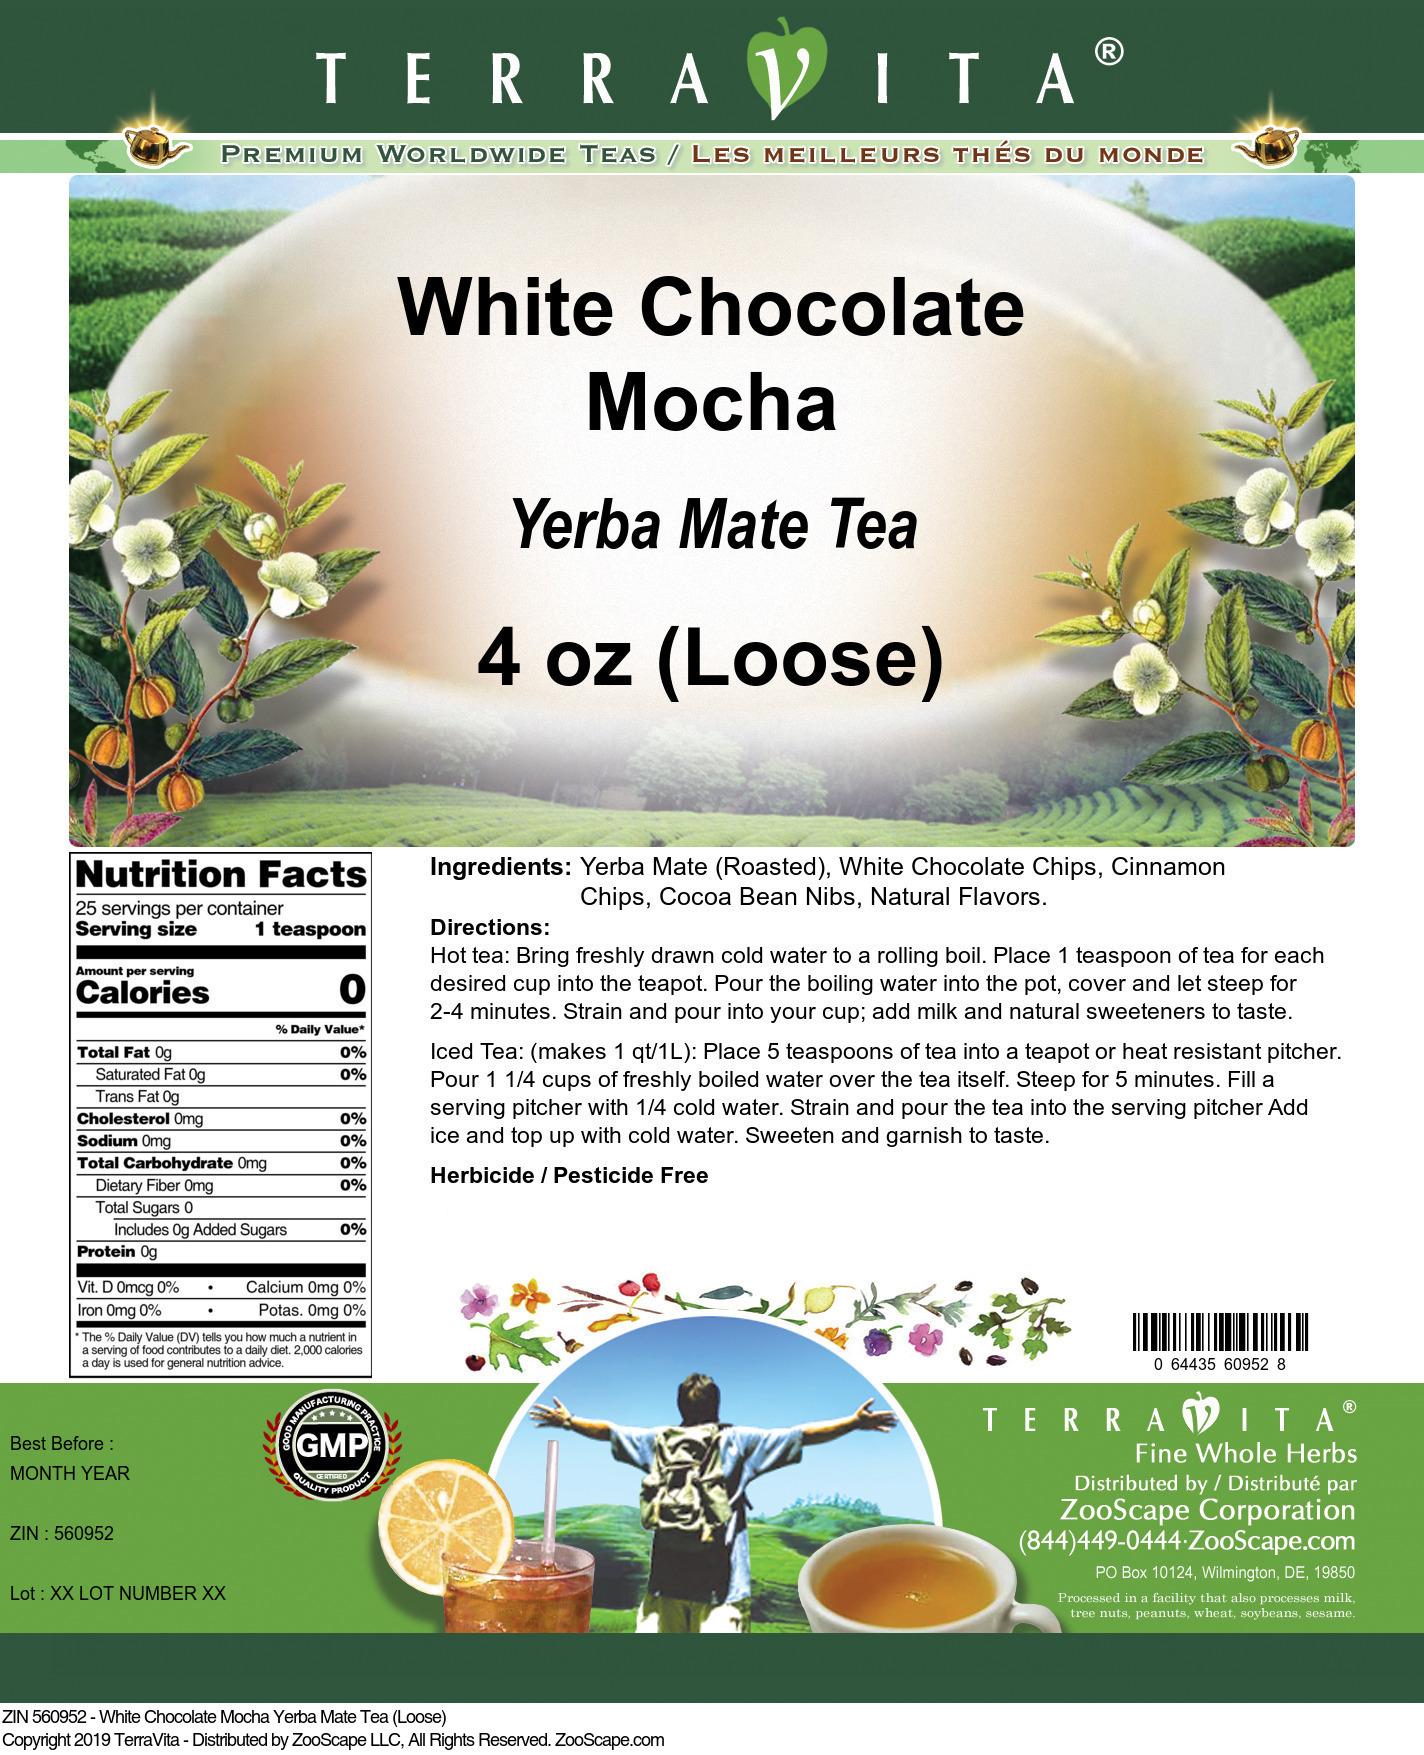 White Chocolate Mocha Yerba Mate Tea (Loose)